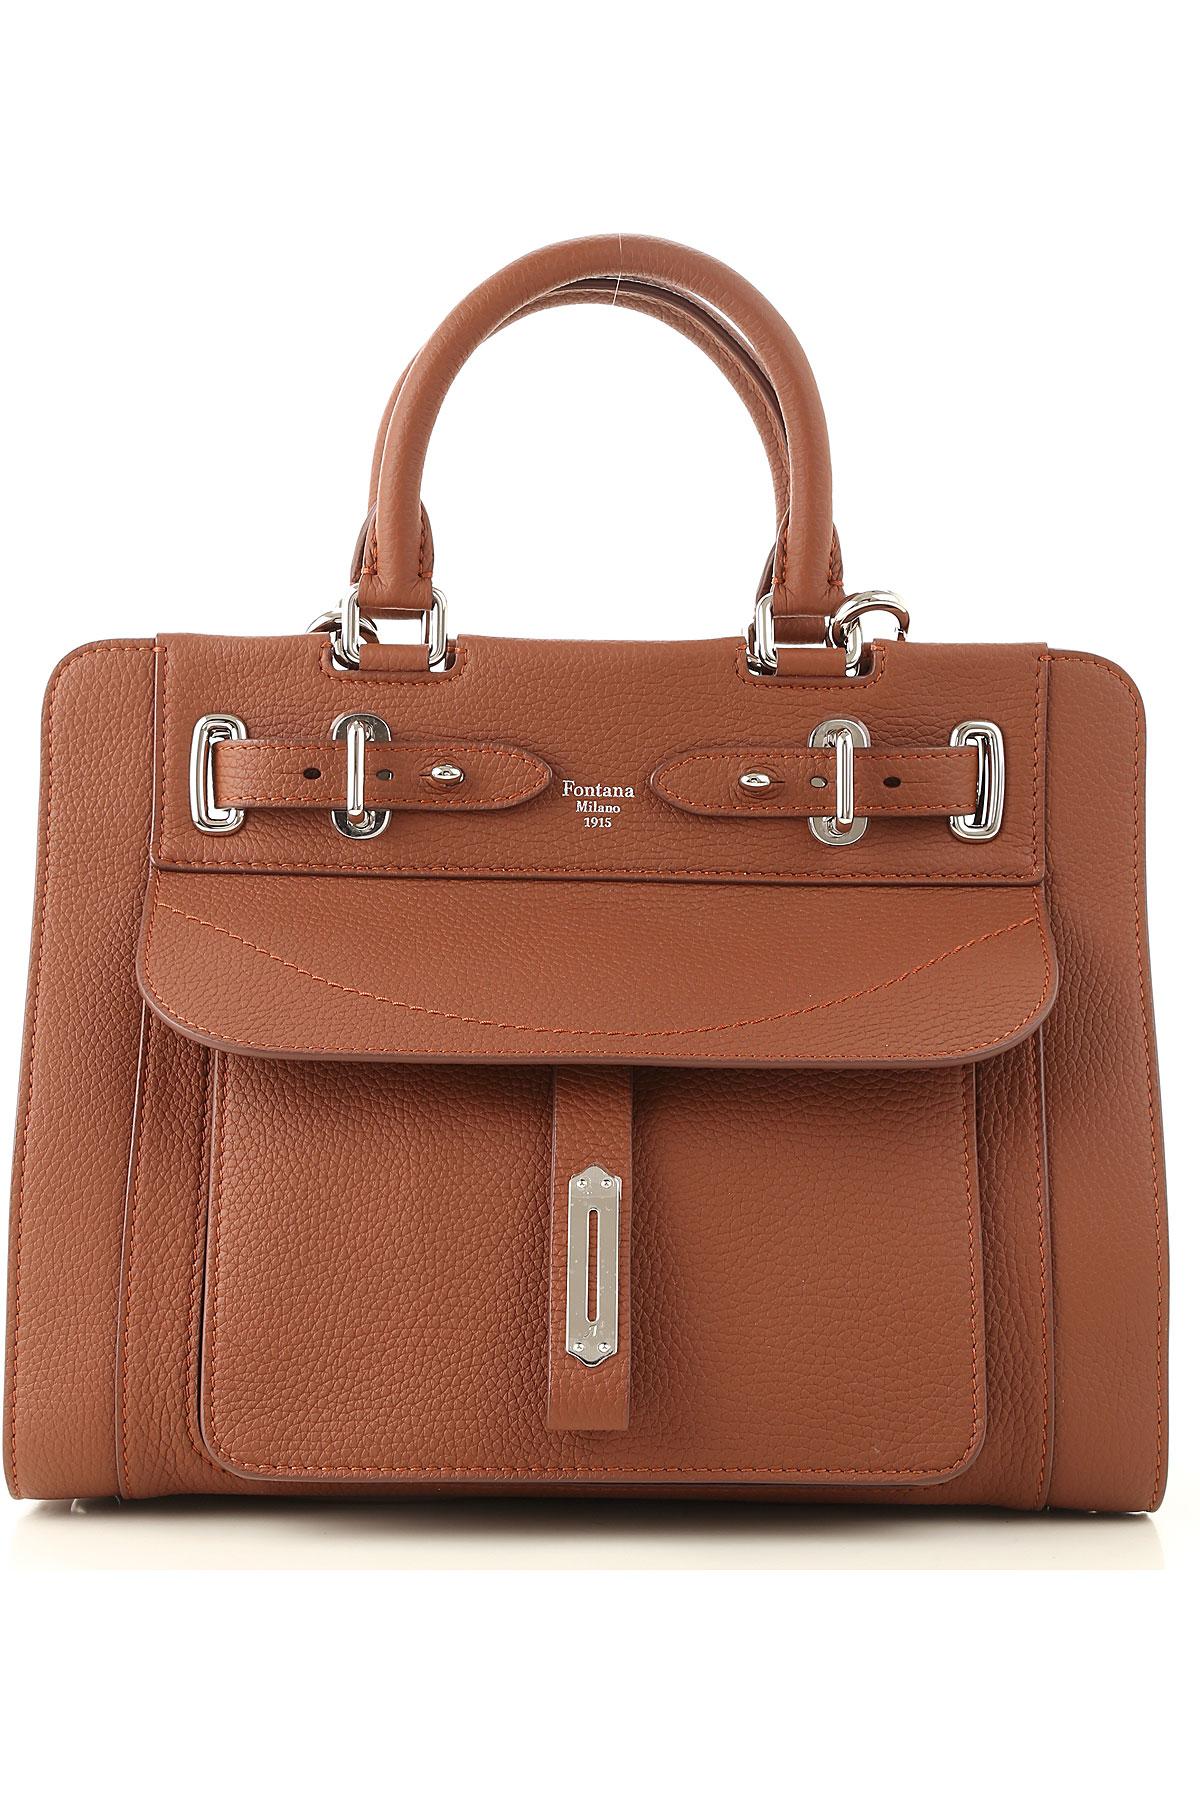 Fontana Top Handle Handbag, Red Brown, Crackle Leather, 2019